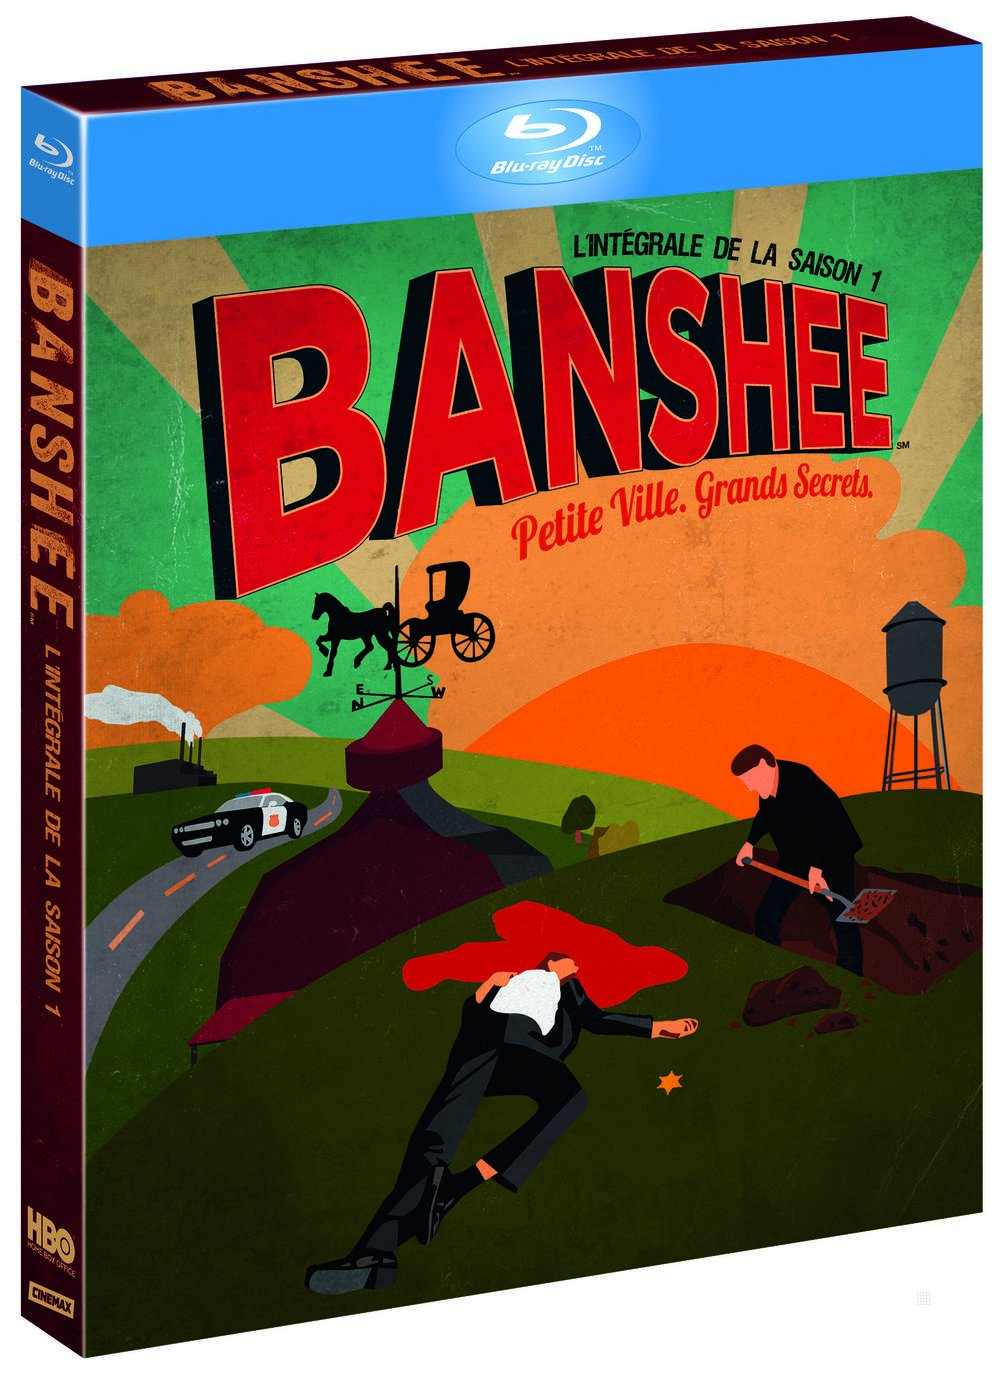 Banshee 71zSI46%2Bn3L._SL1375_